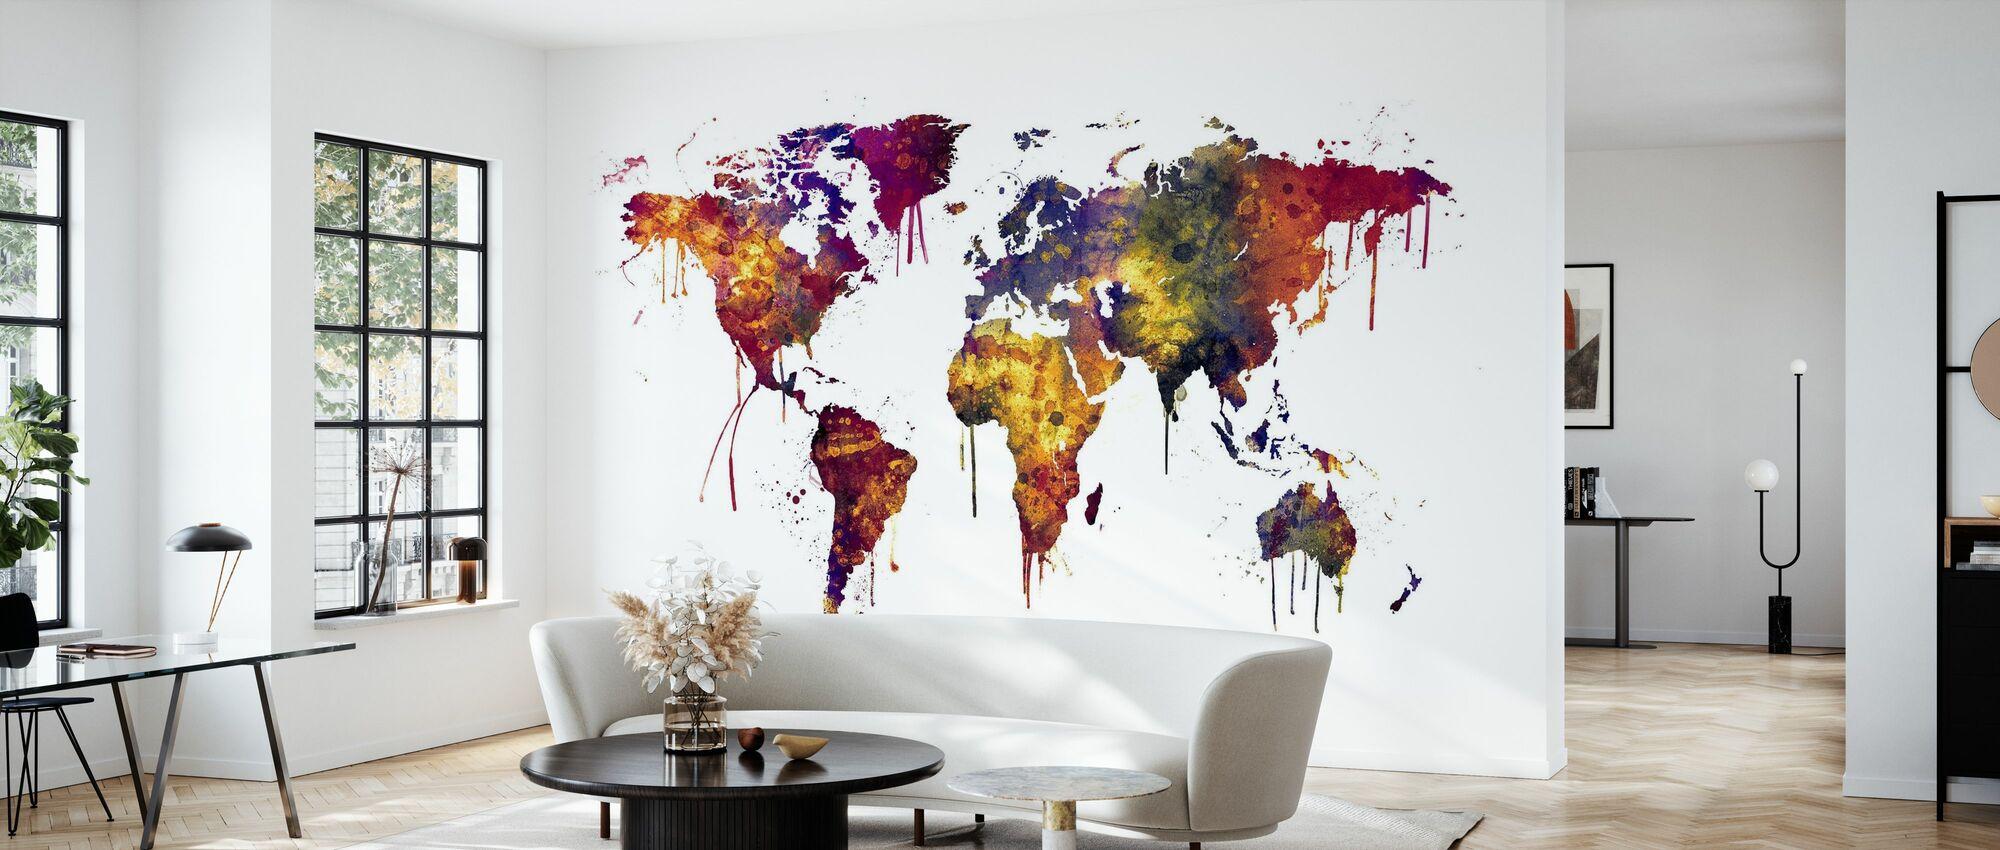 Watercolor World Map 2 - Wallpaper - Living Room